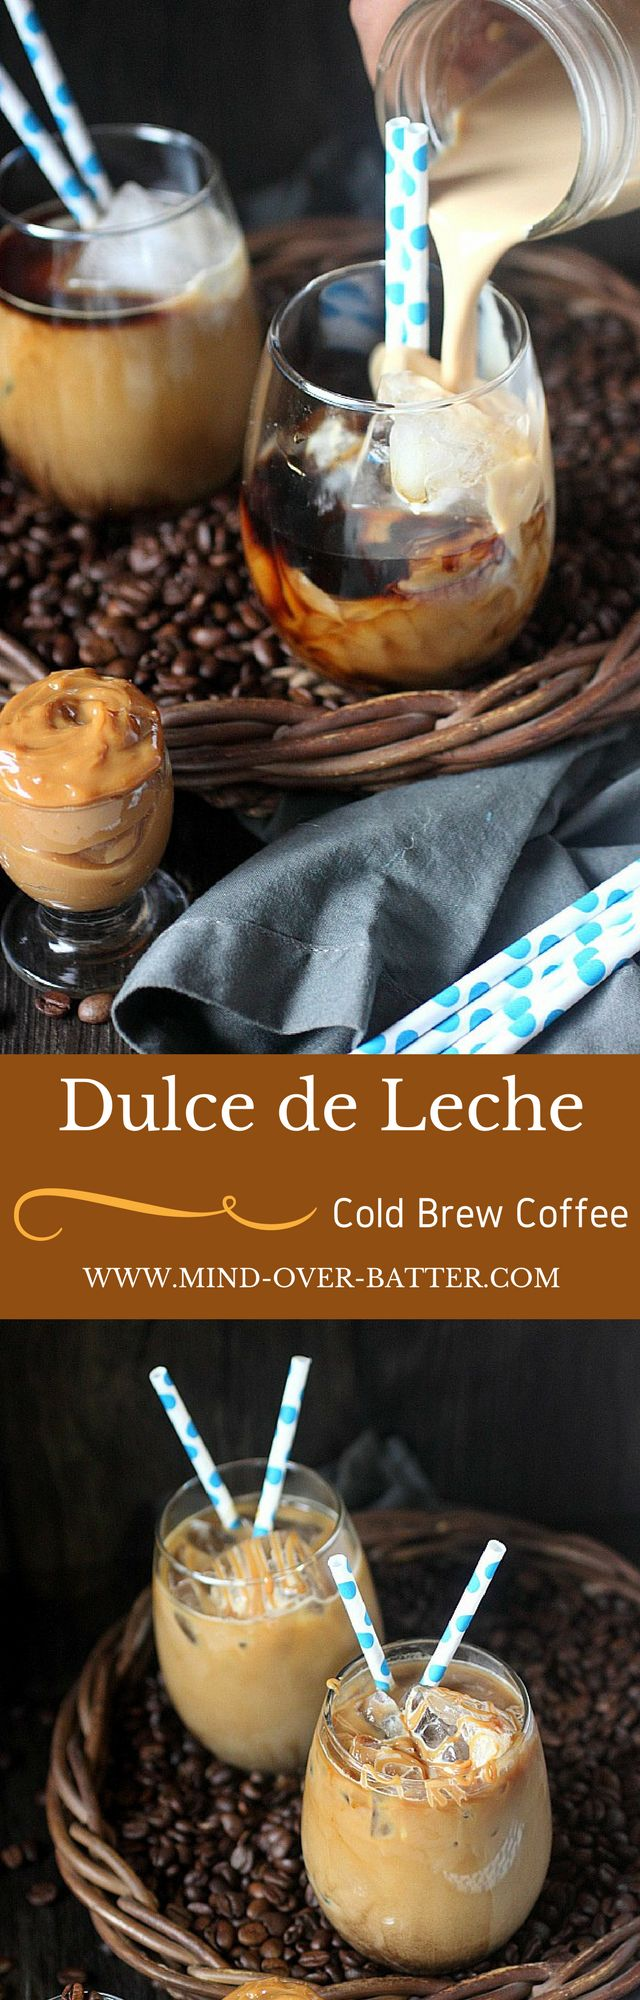 Dulce de Leche Cold Brew Coffee - www.mind-over-batter.com